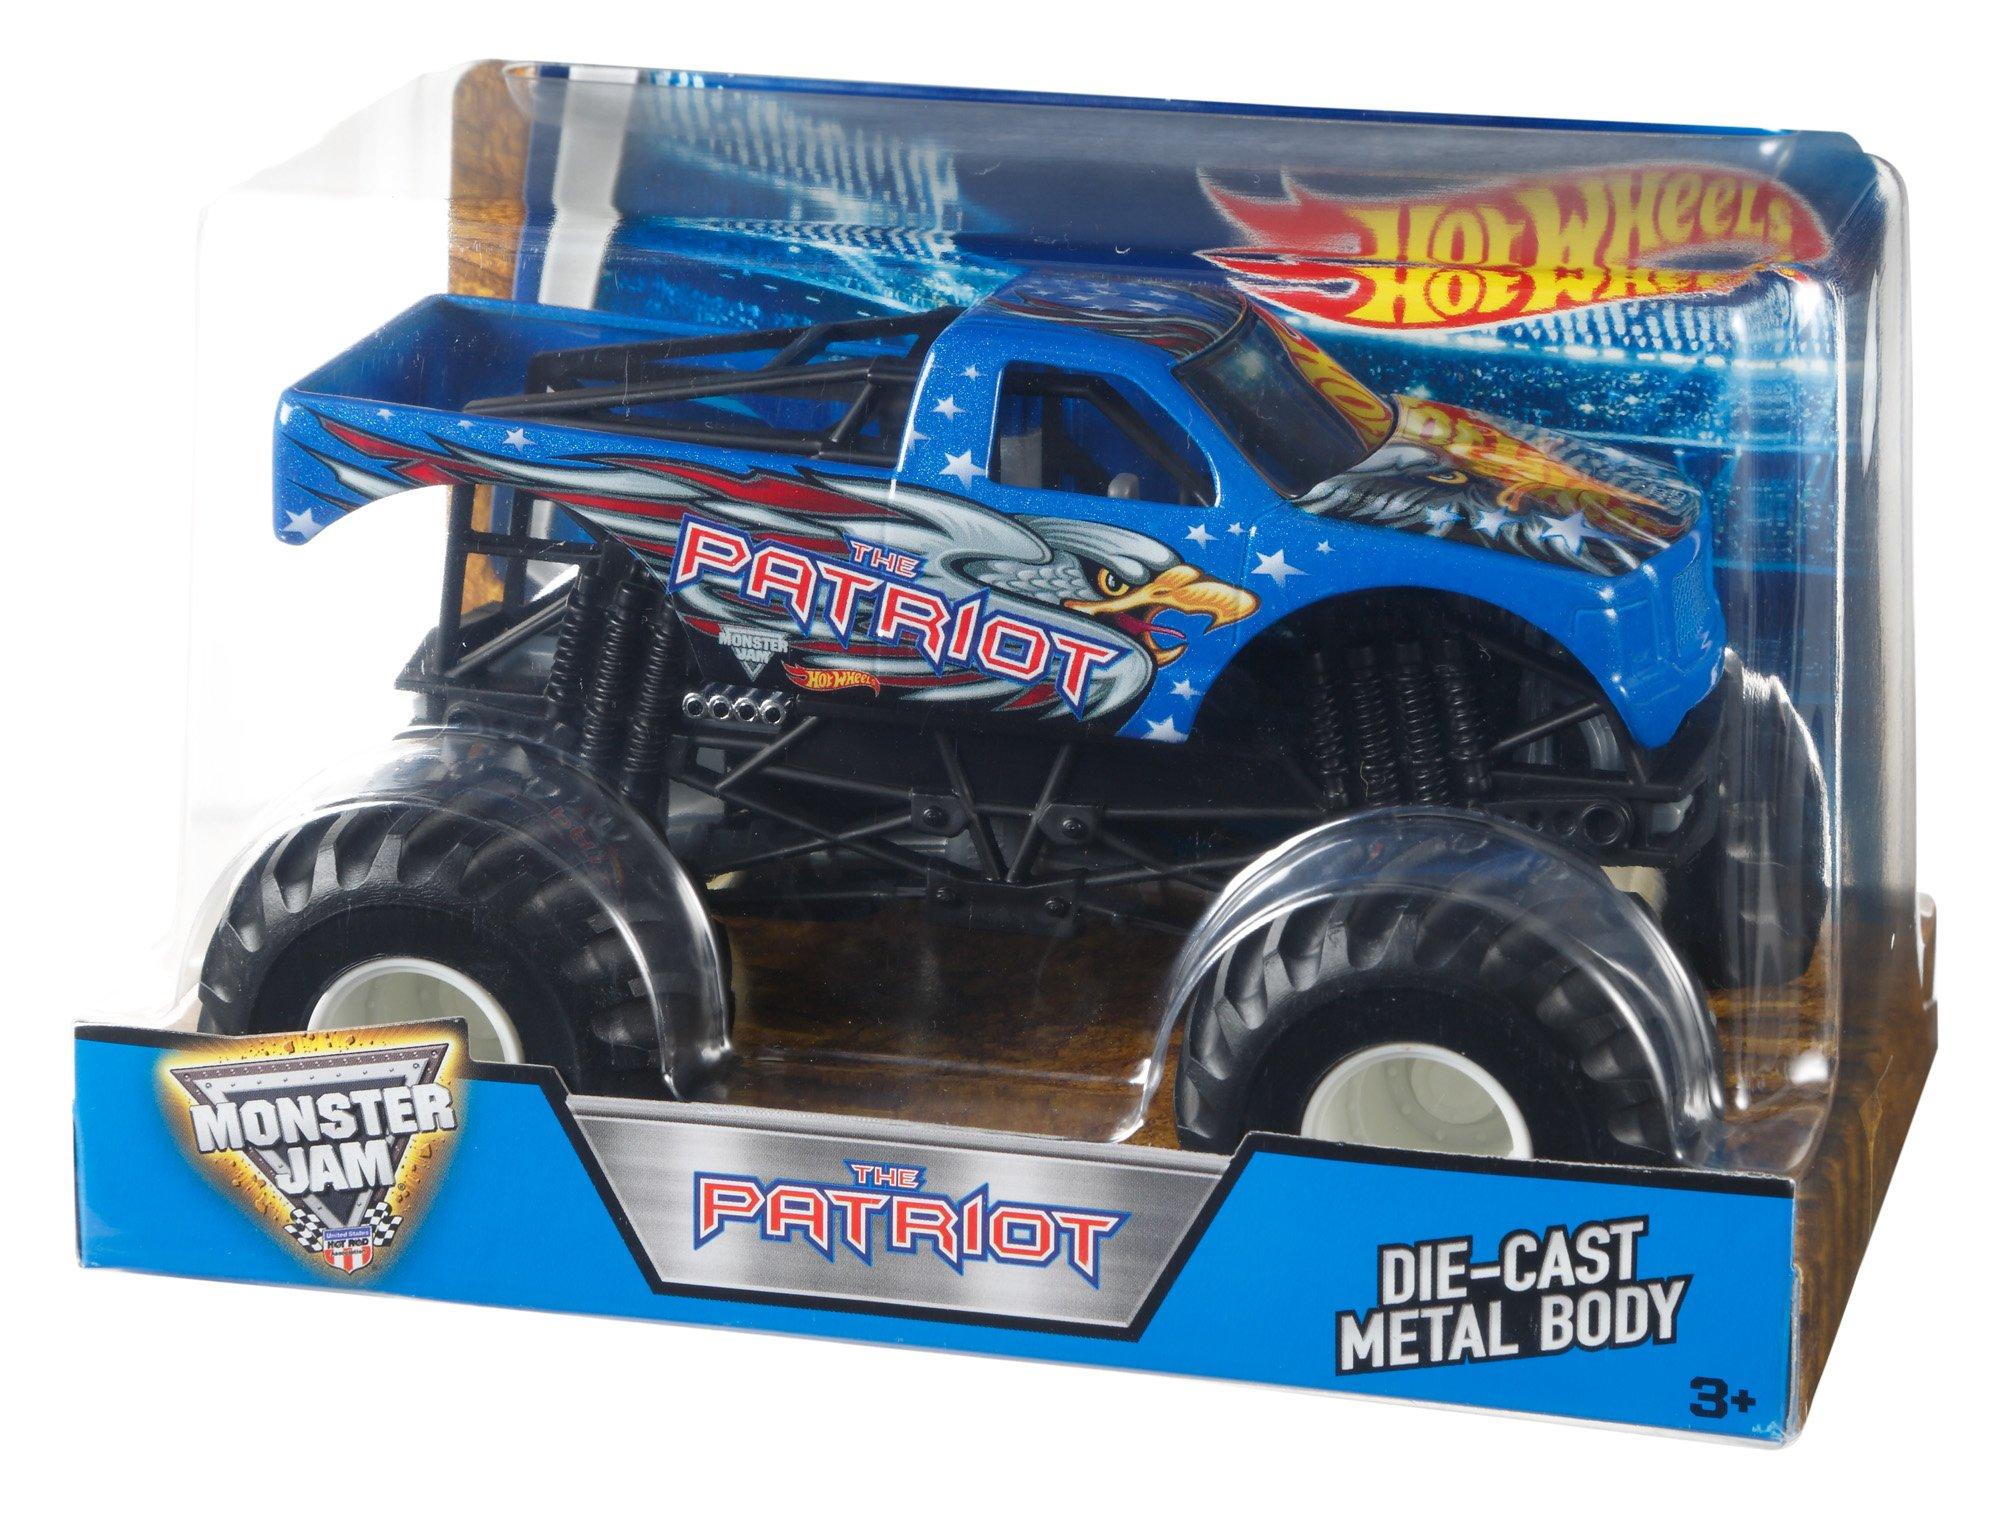 Hot Wheels Monster Jam 1:24 Vehículo Patriot